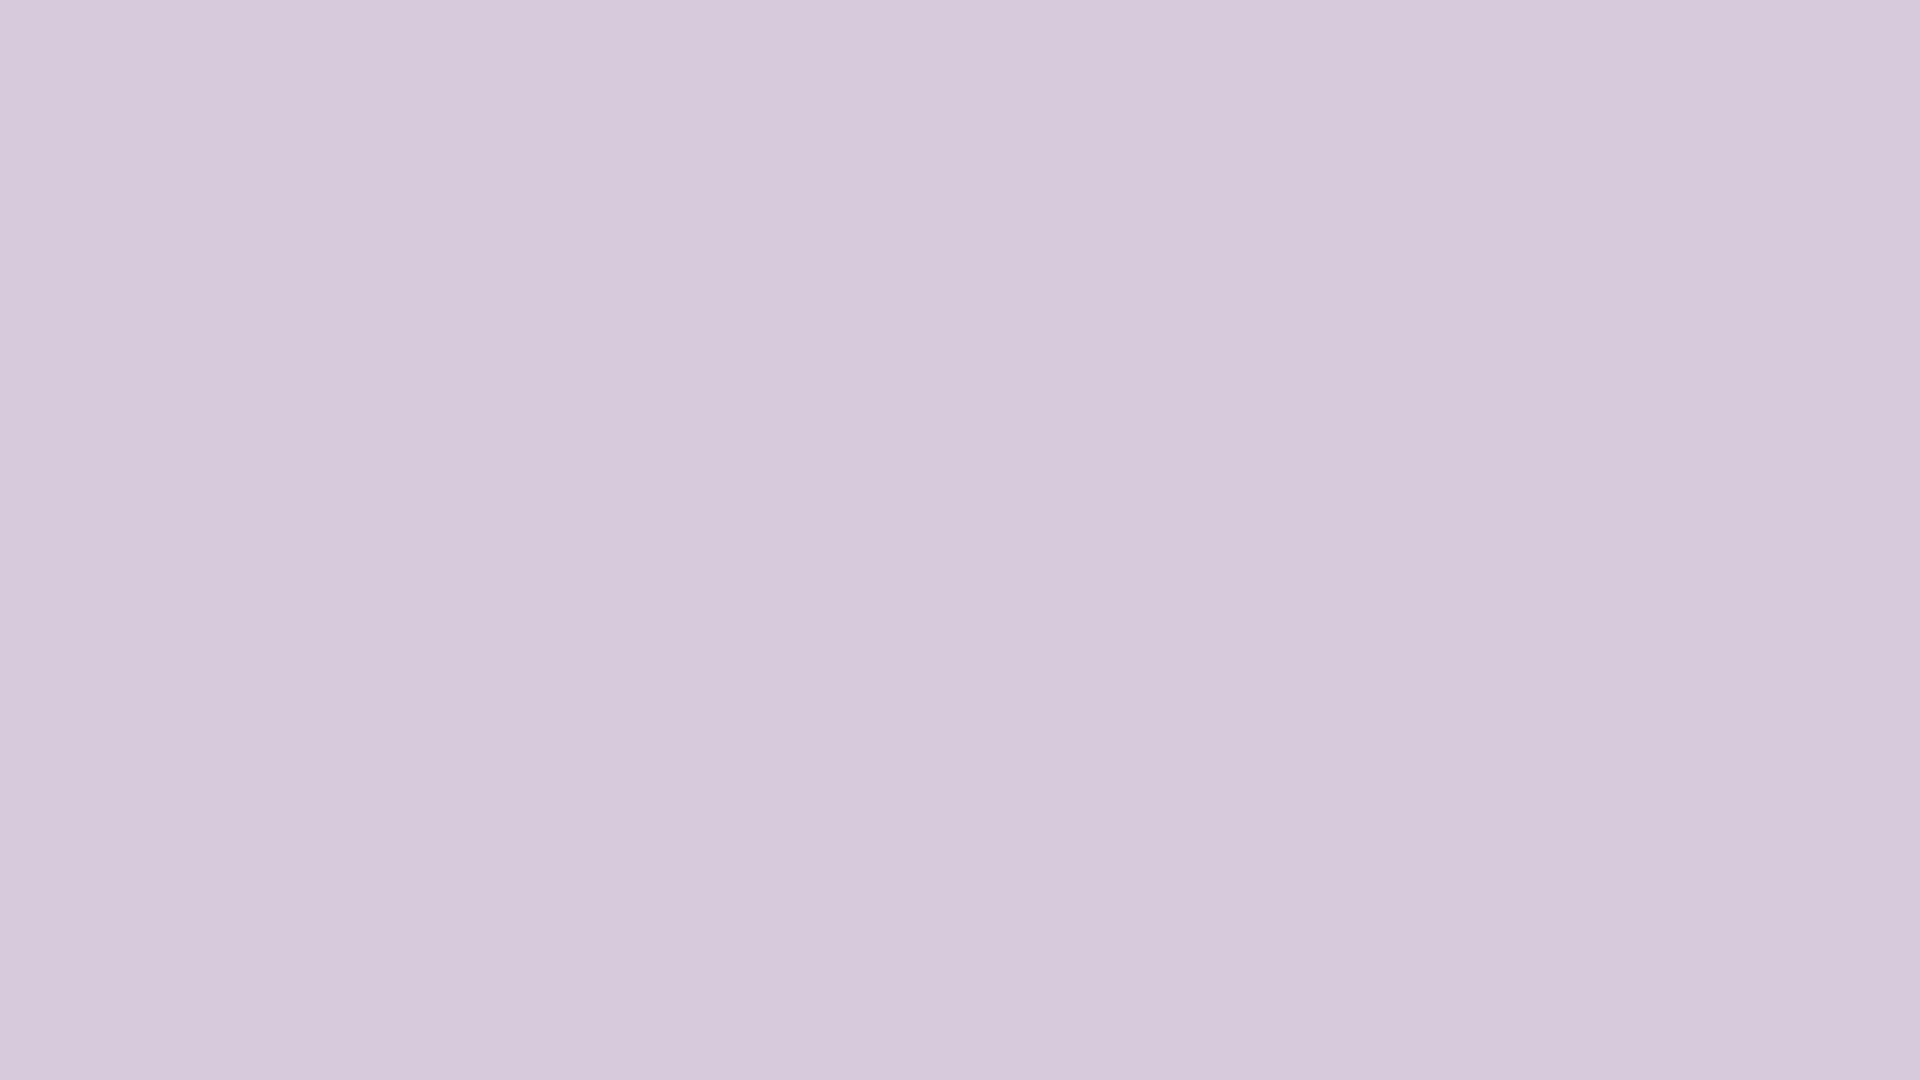 1920x1080 Languid Lavender Solid Color Background